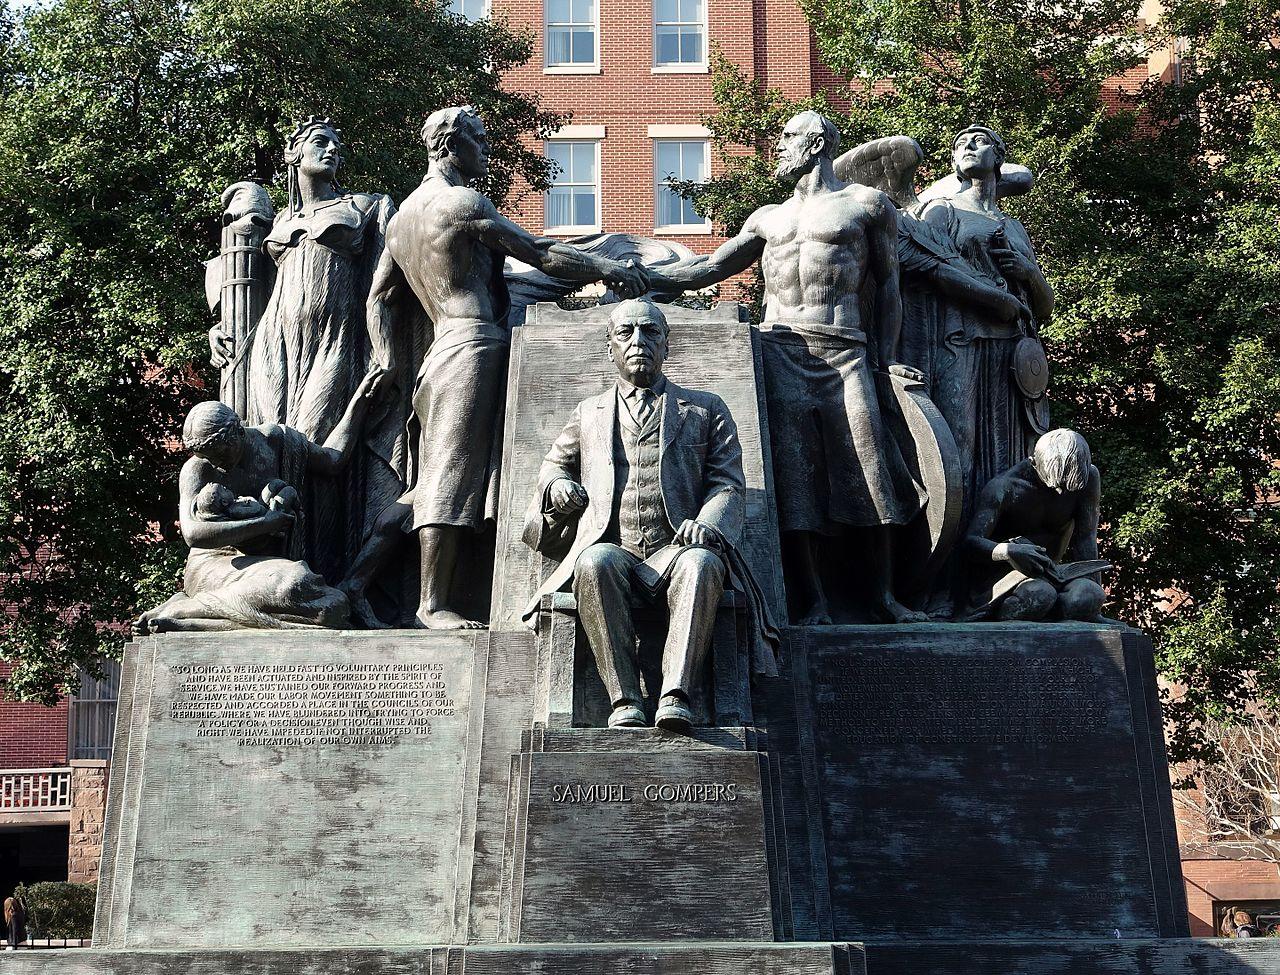 33Samuel_Gompers_Memorial_-_Washington,_DC_-_DSC06015.jpg